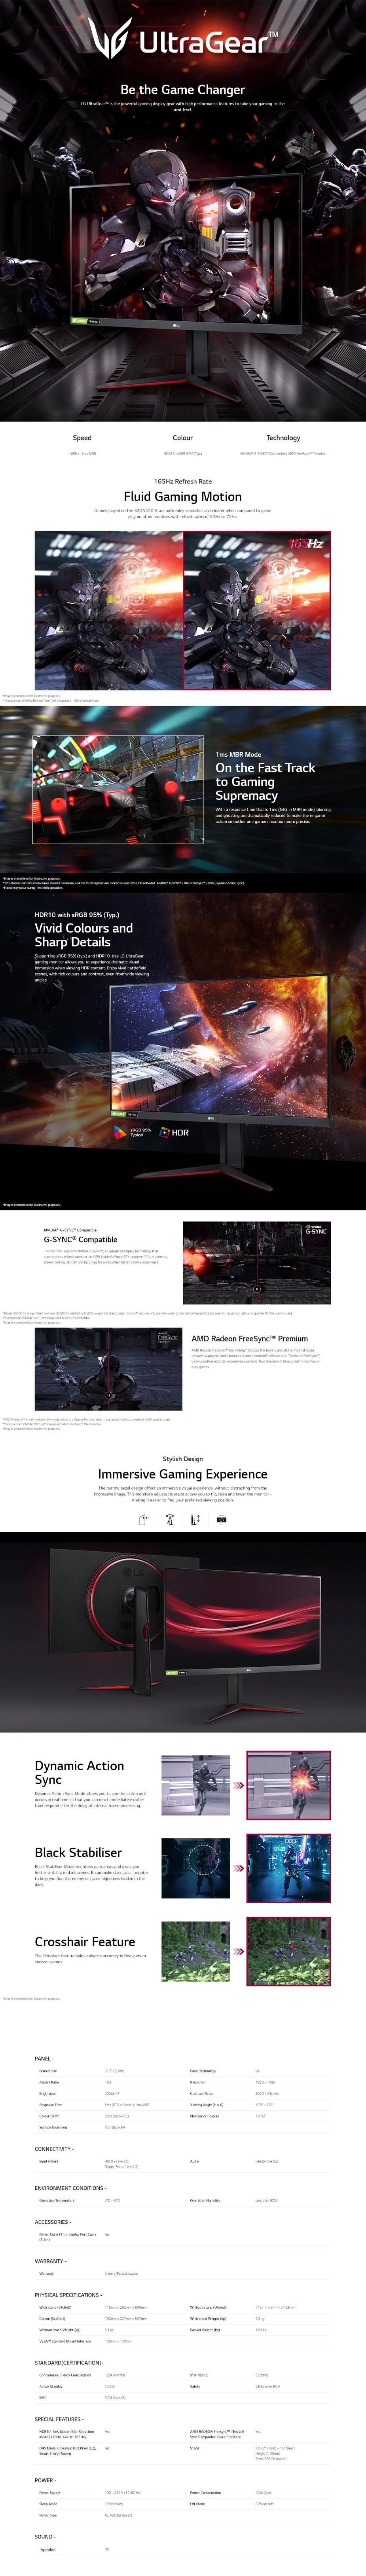 "LG UltraGear 32GN550-B 31.5"" 165Hz Full HD 1ms G-Sync Compat. VA Gaming Monitor - Overview 1"